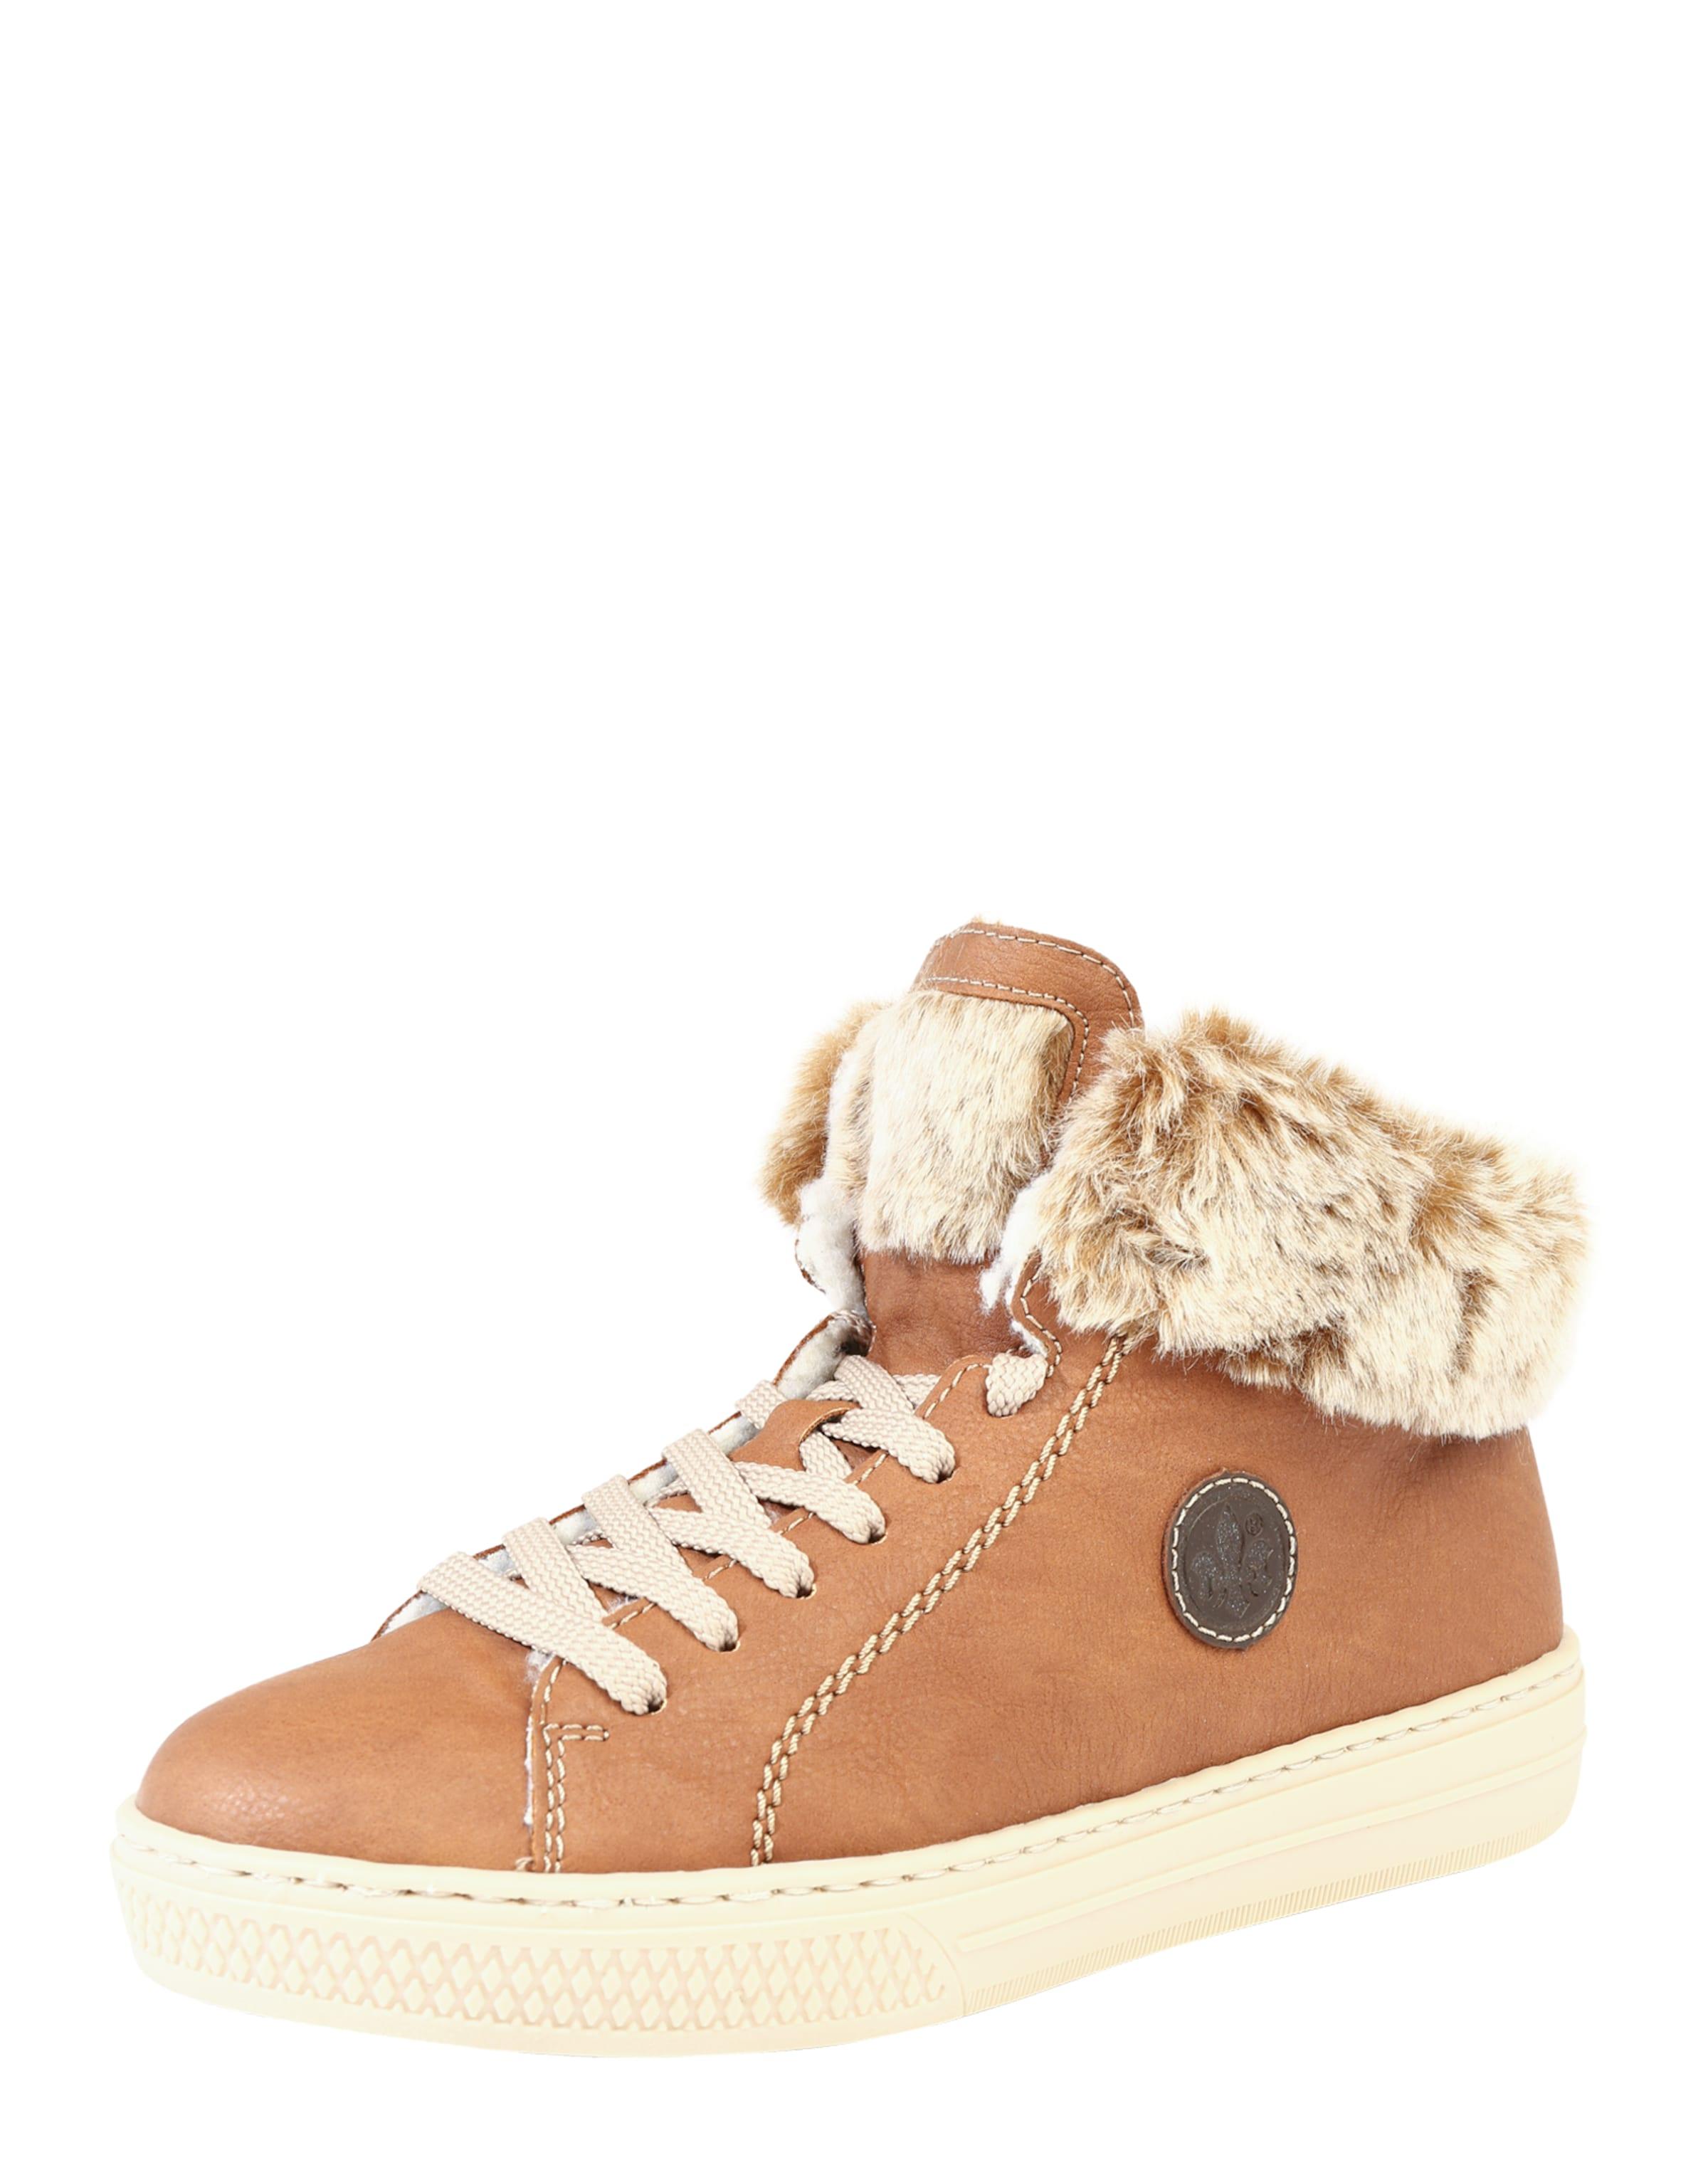 RIEKER Sneaker mit warmem Futter Hohe Qualität